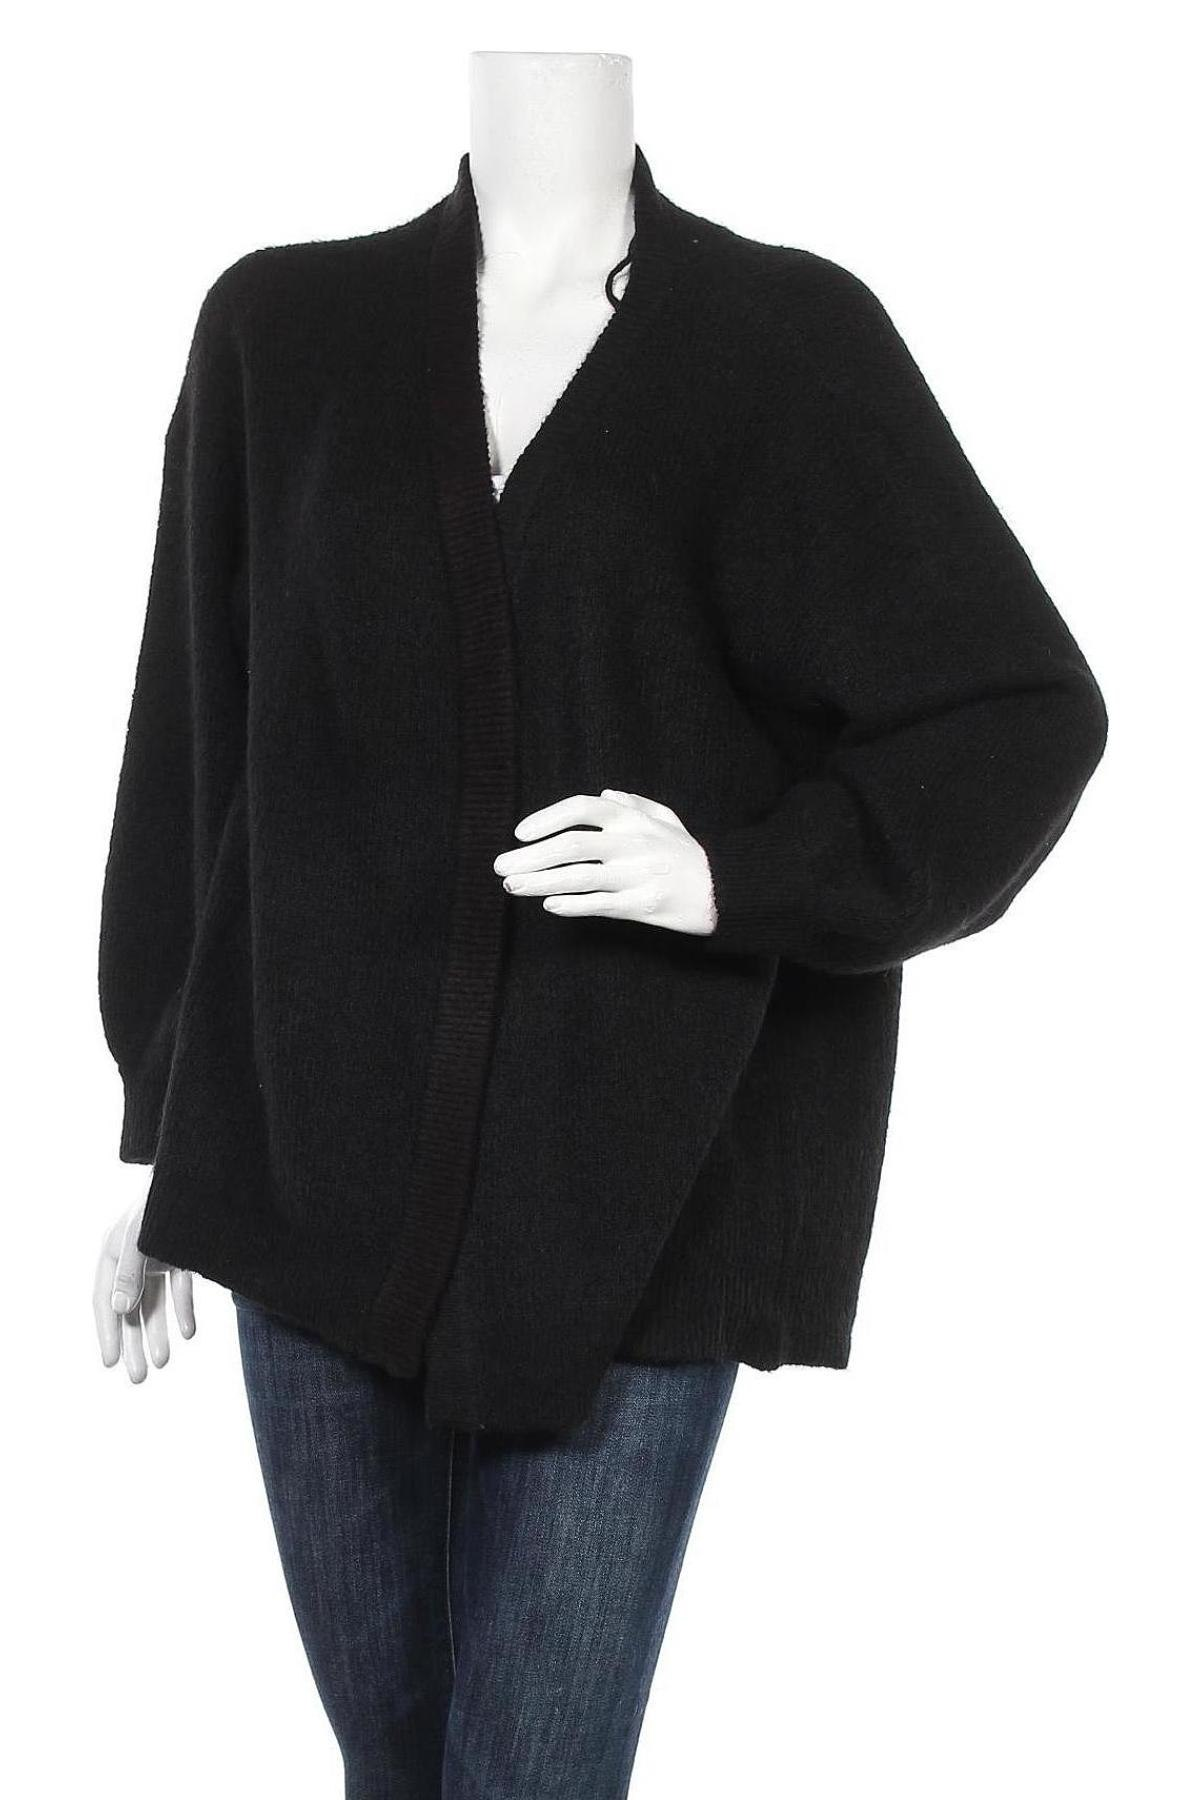 Дамска жилетка Vero Moda, Размер XL, Цвят Черен, Цена 23,20лв.